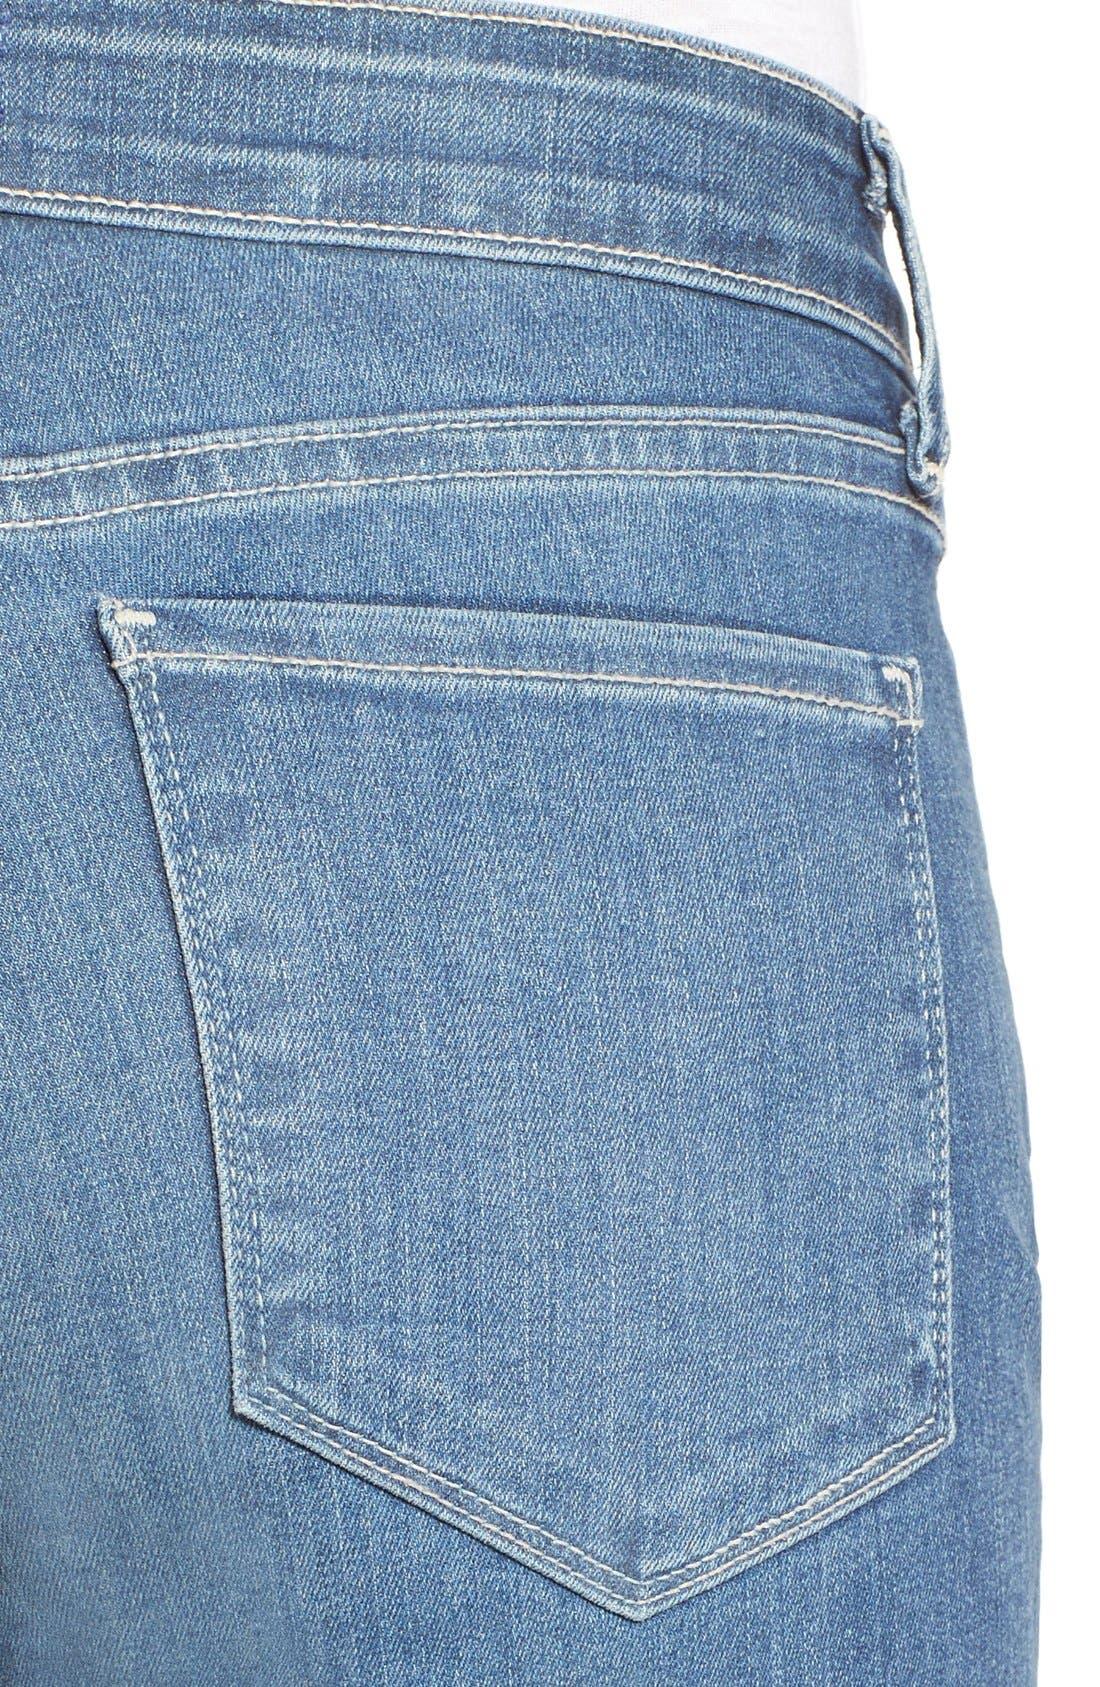 Marilyn Stretch Straight Leg Jeans,                             Alternate thumbnail 4, color,                             Heyburn